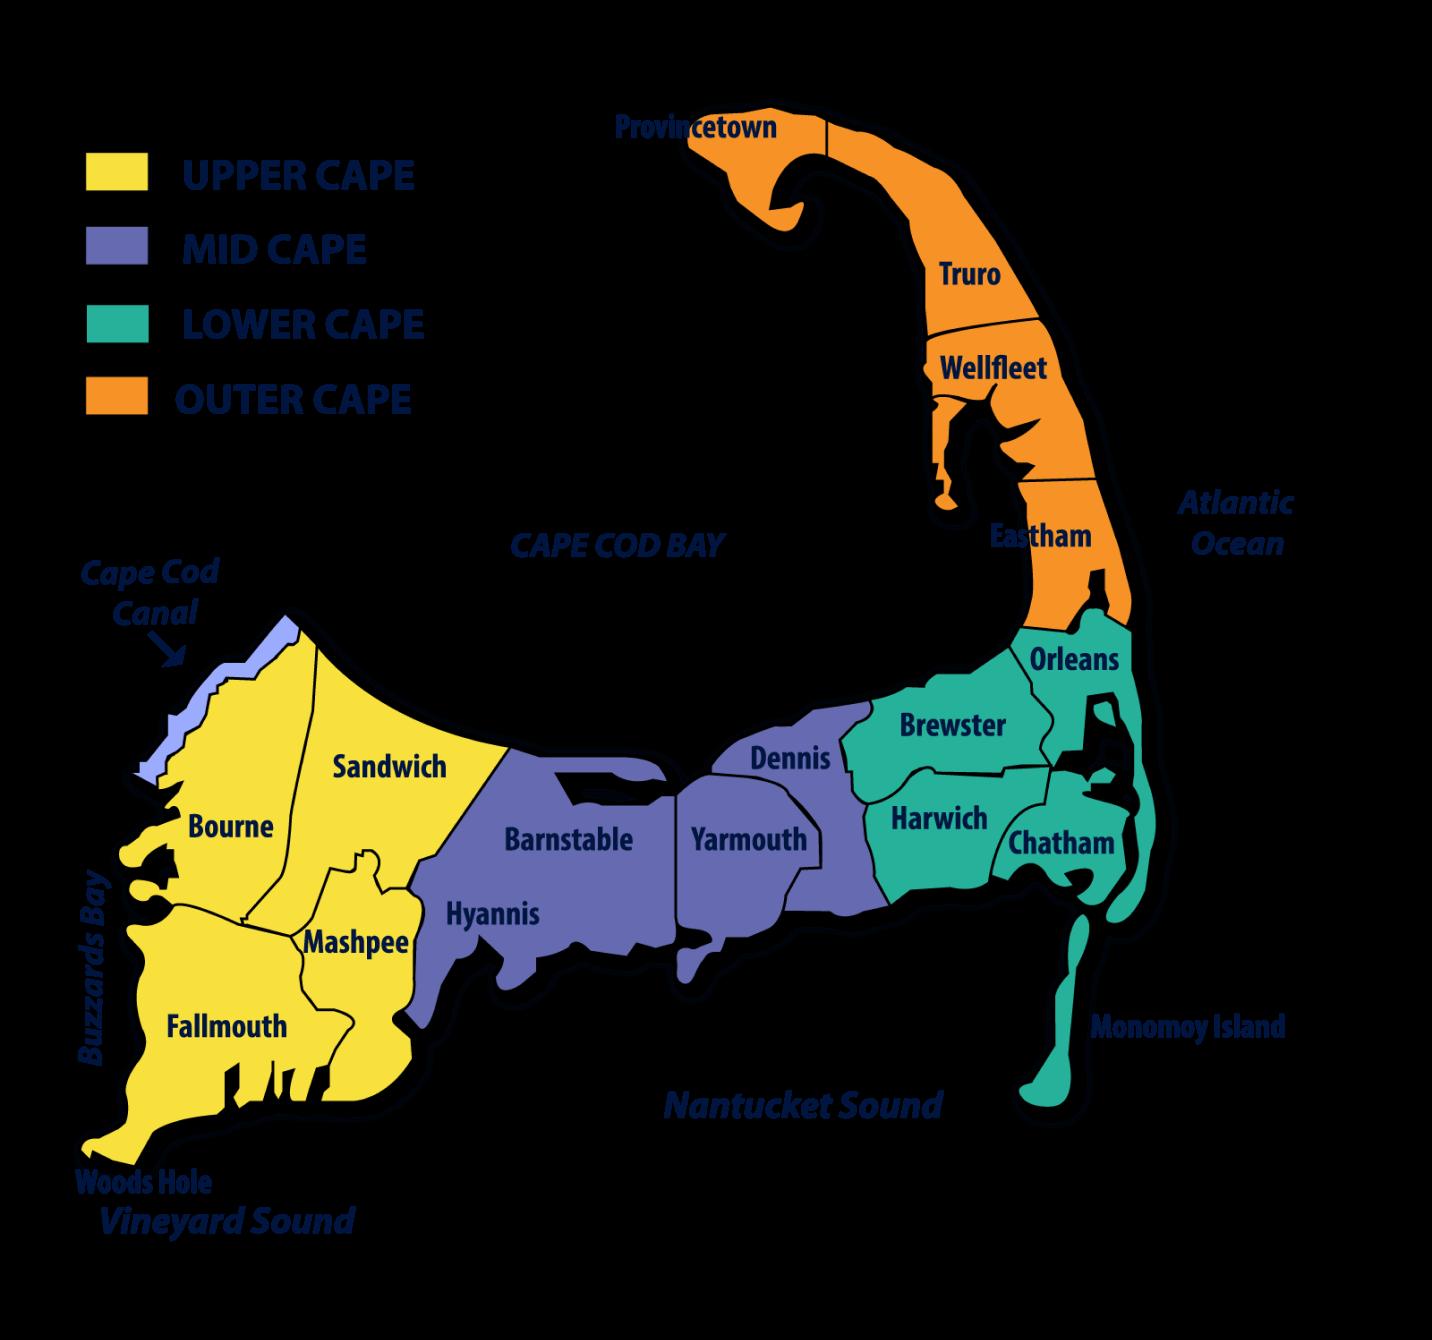 capecod map 4